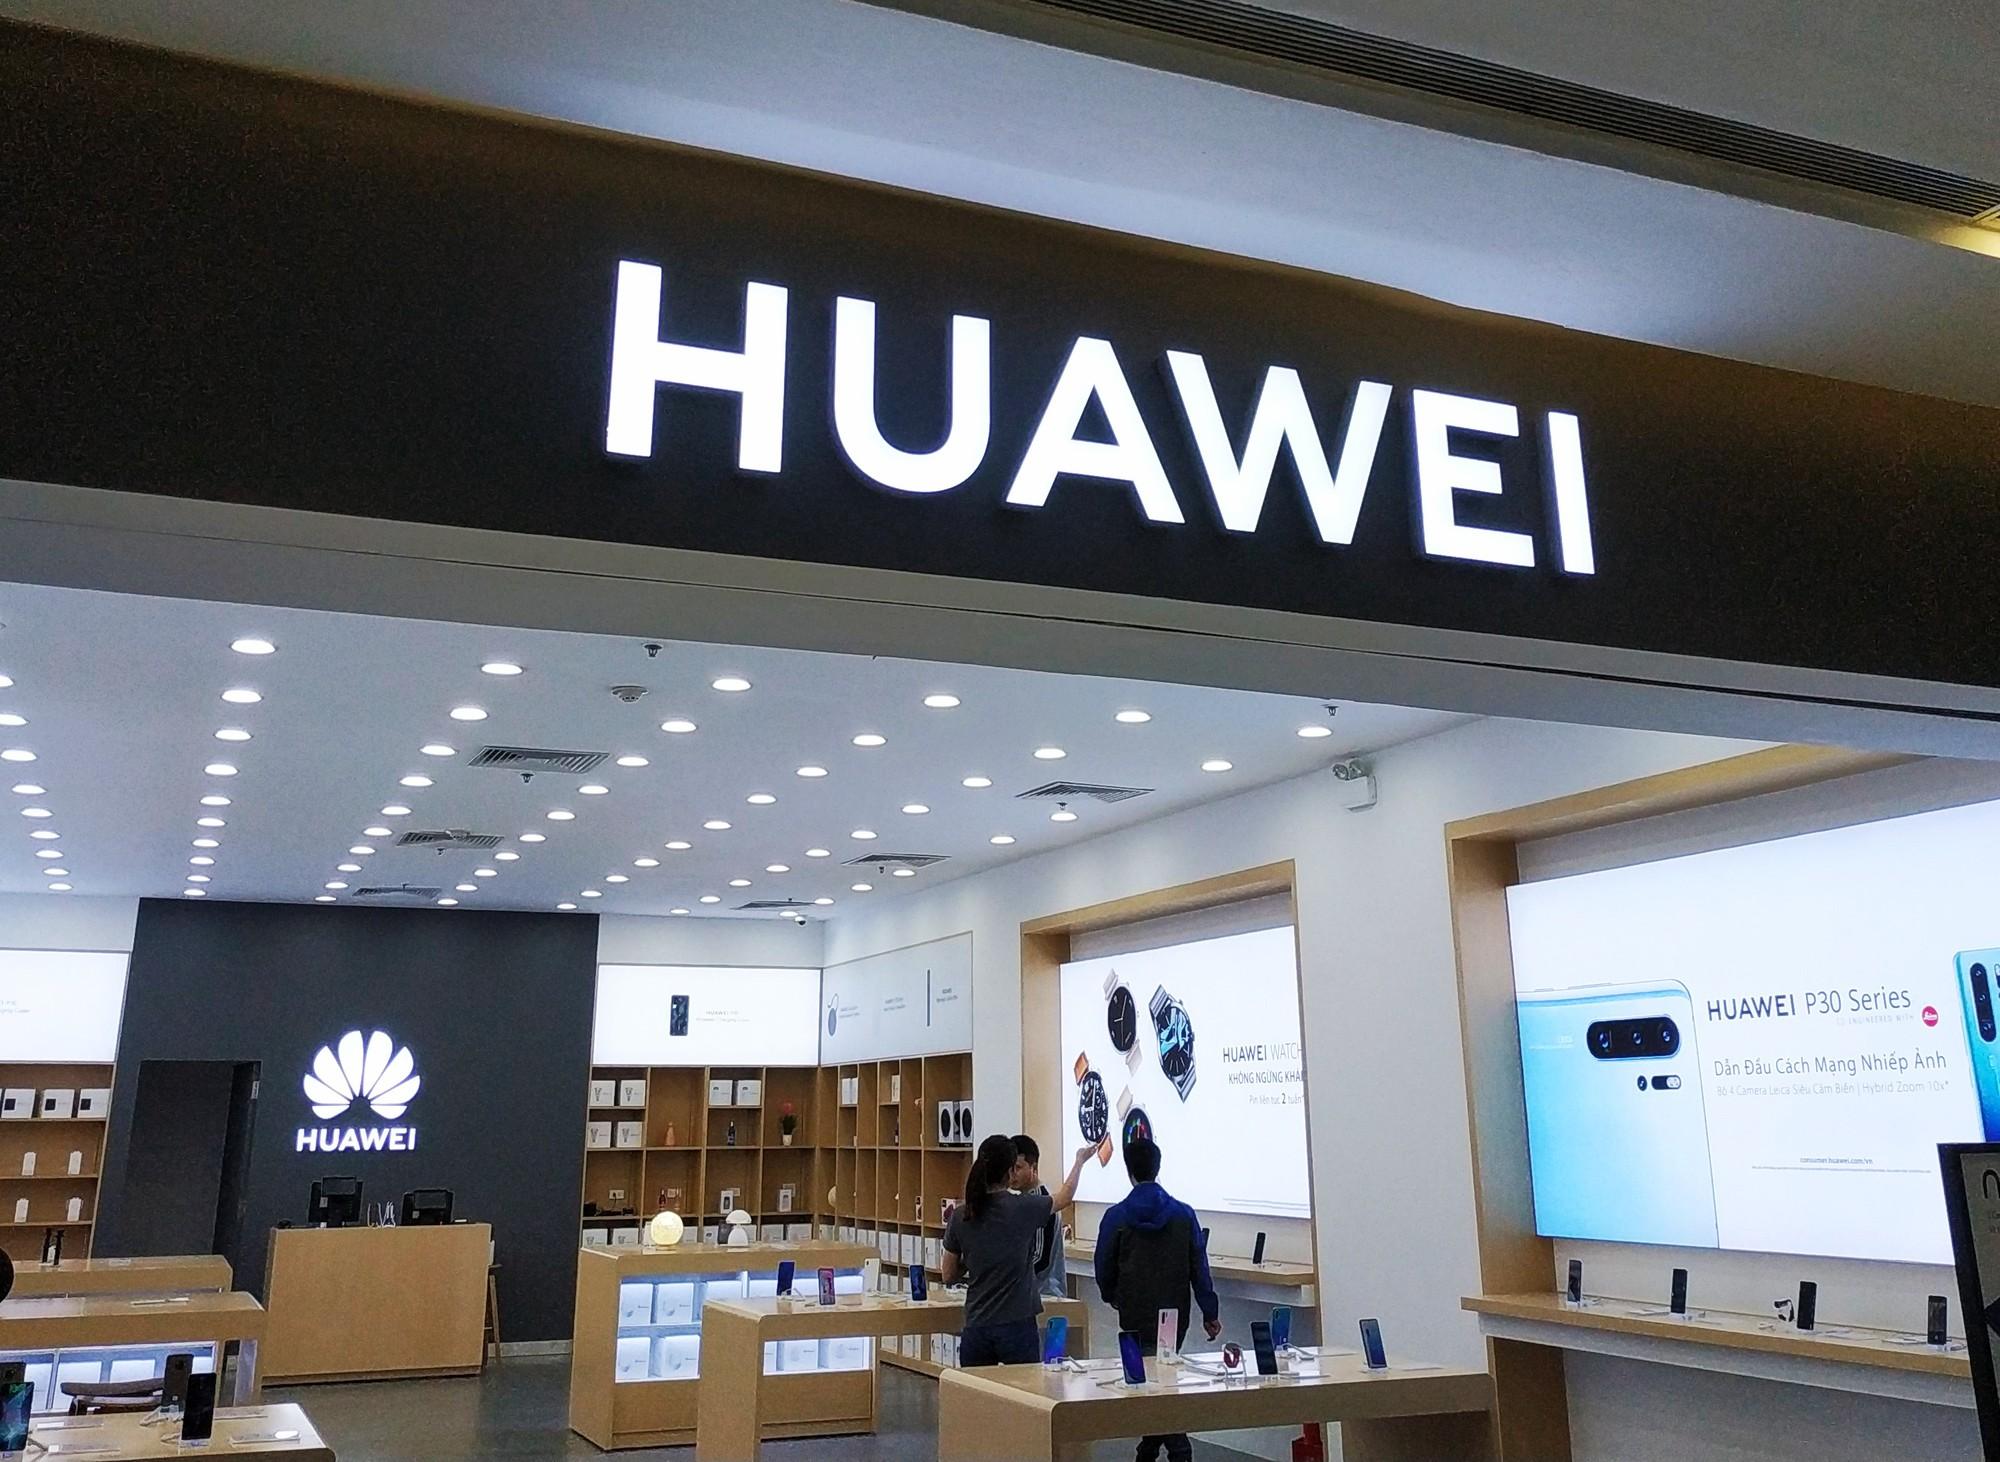 Huawei vincom 2 self (3)